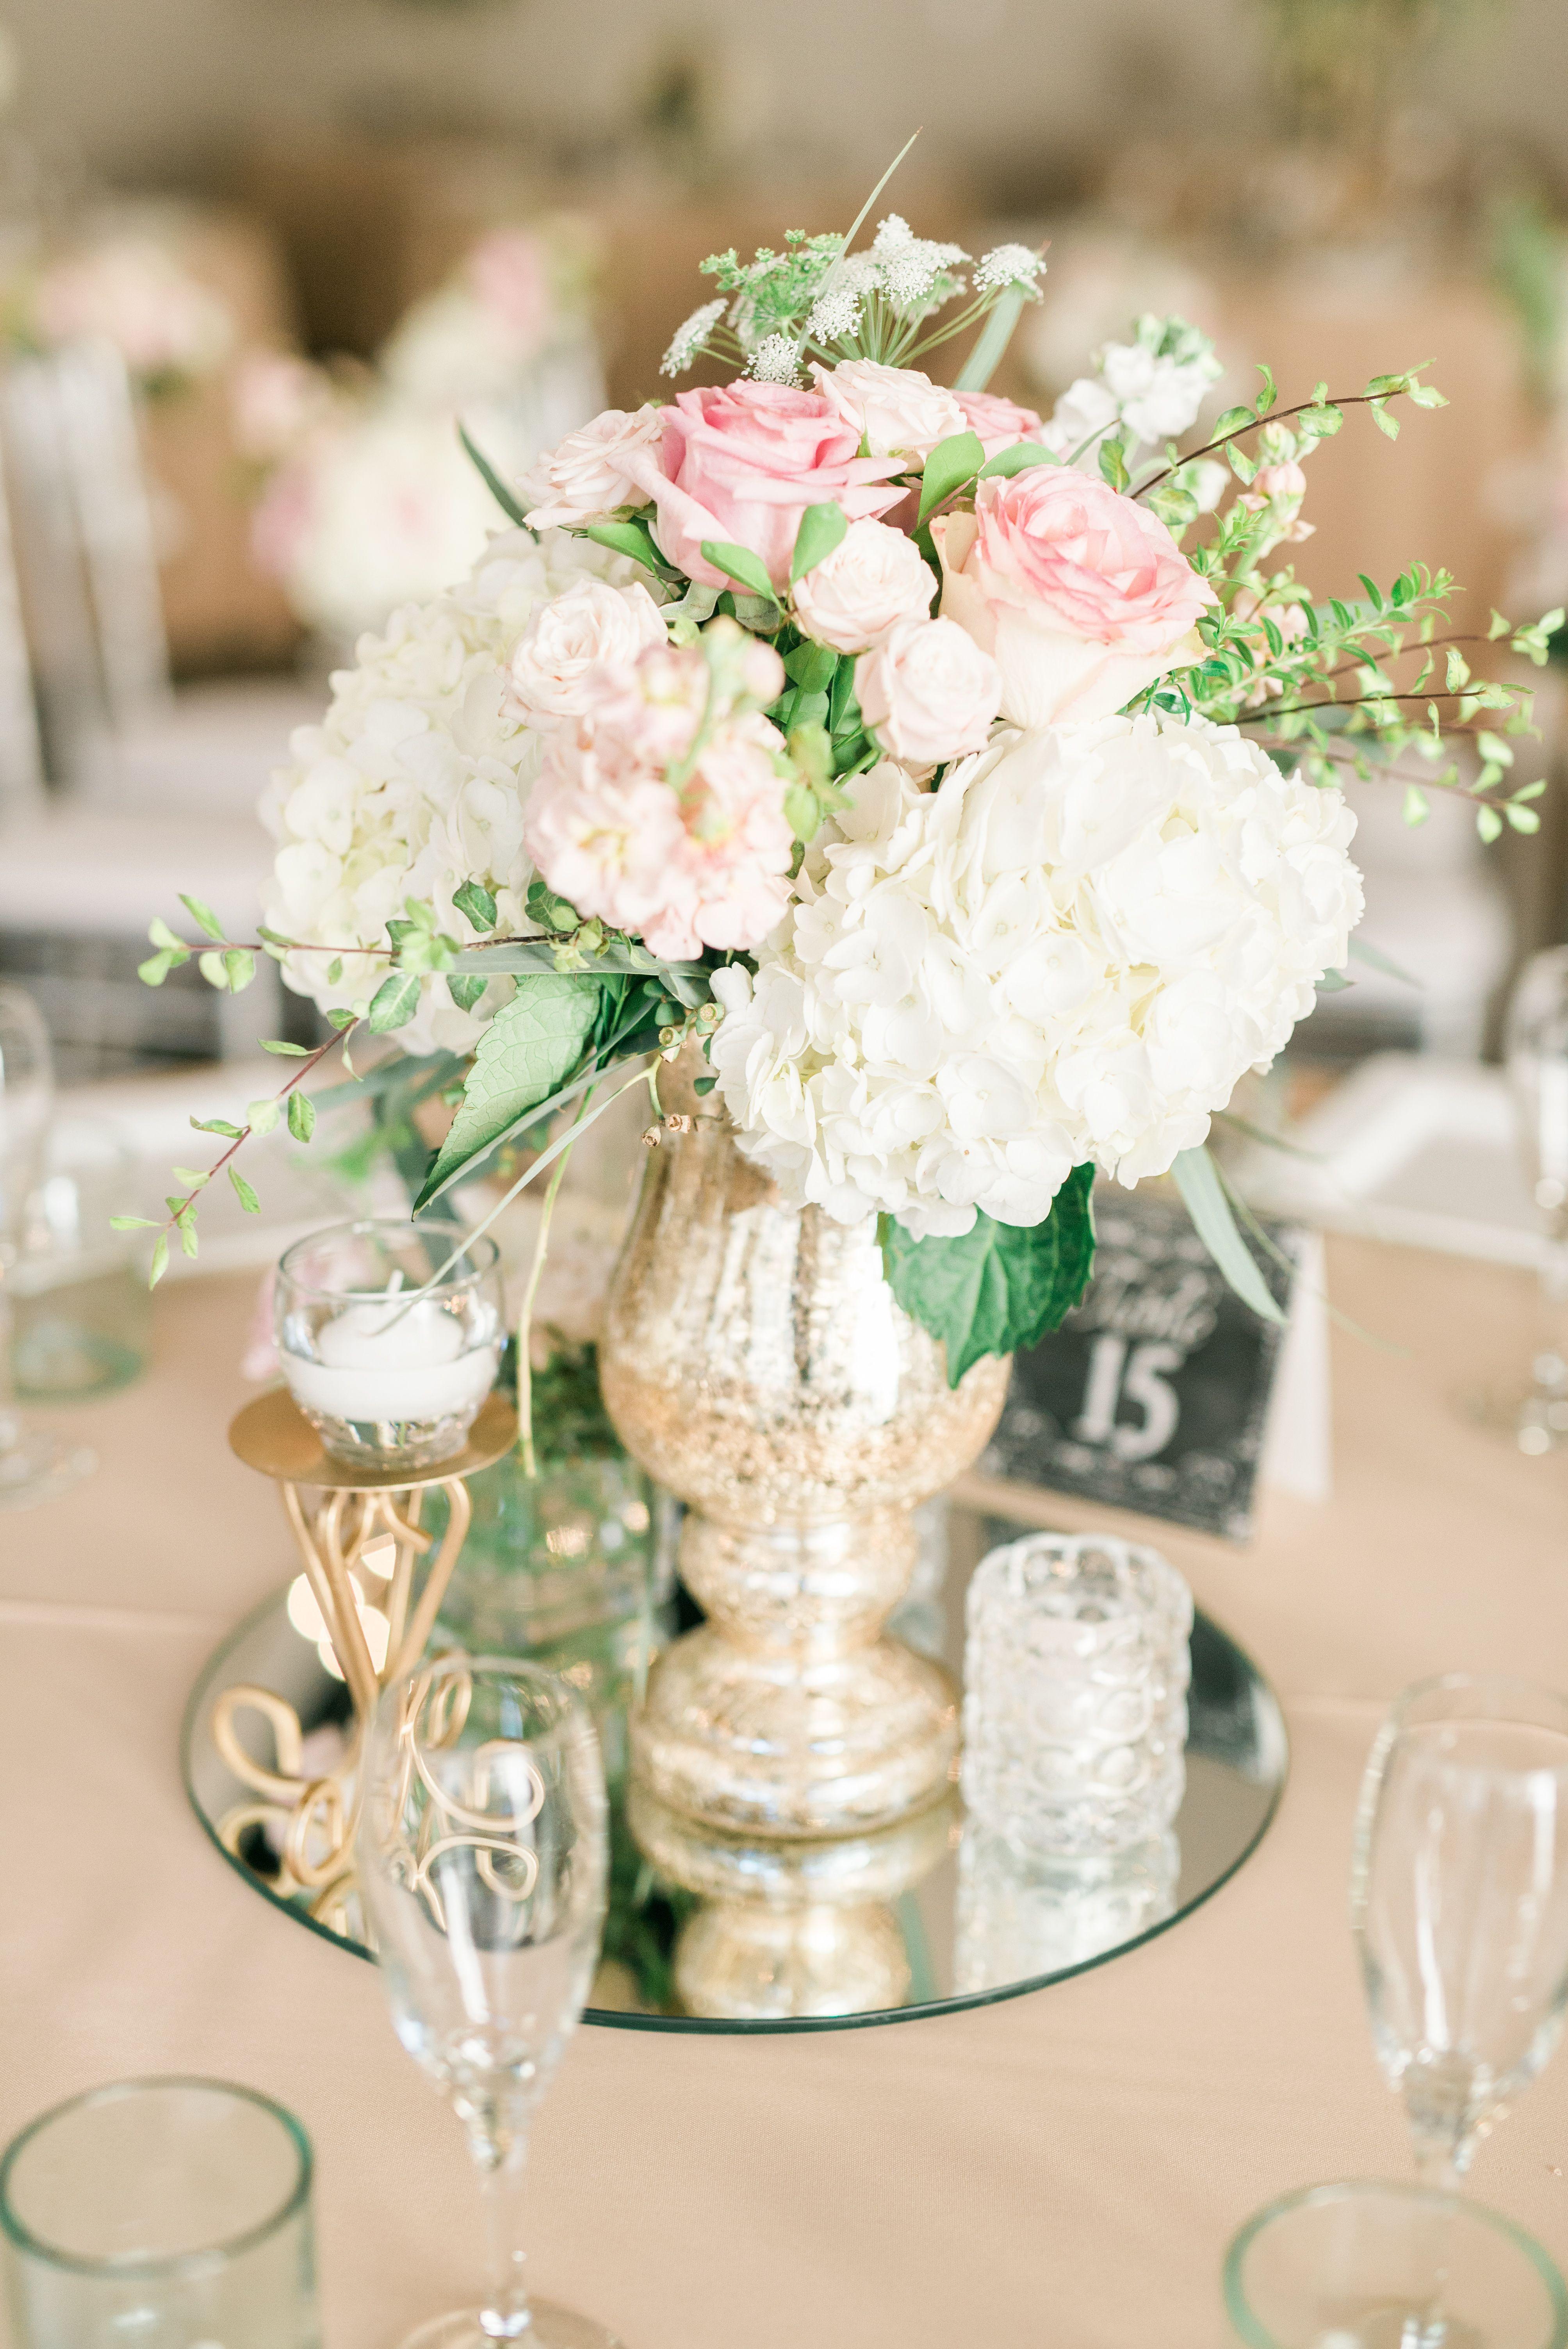 Really Romantic Classic Wedding Mirror CenterpiecesMirror